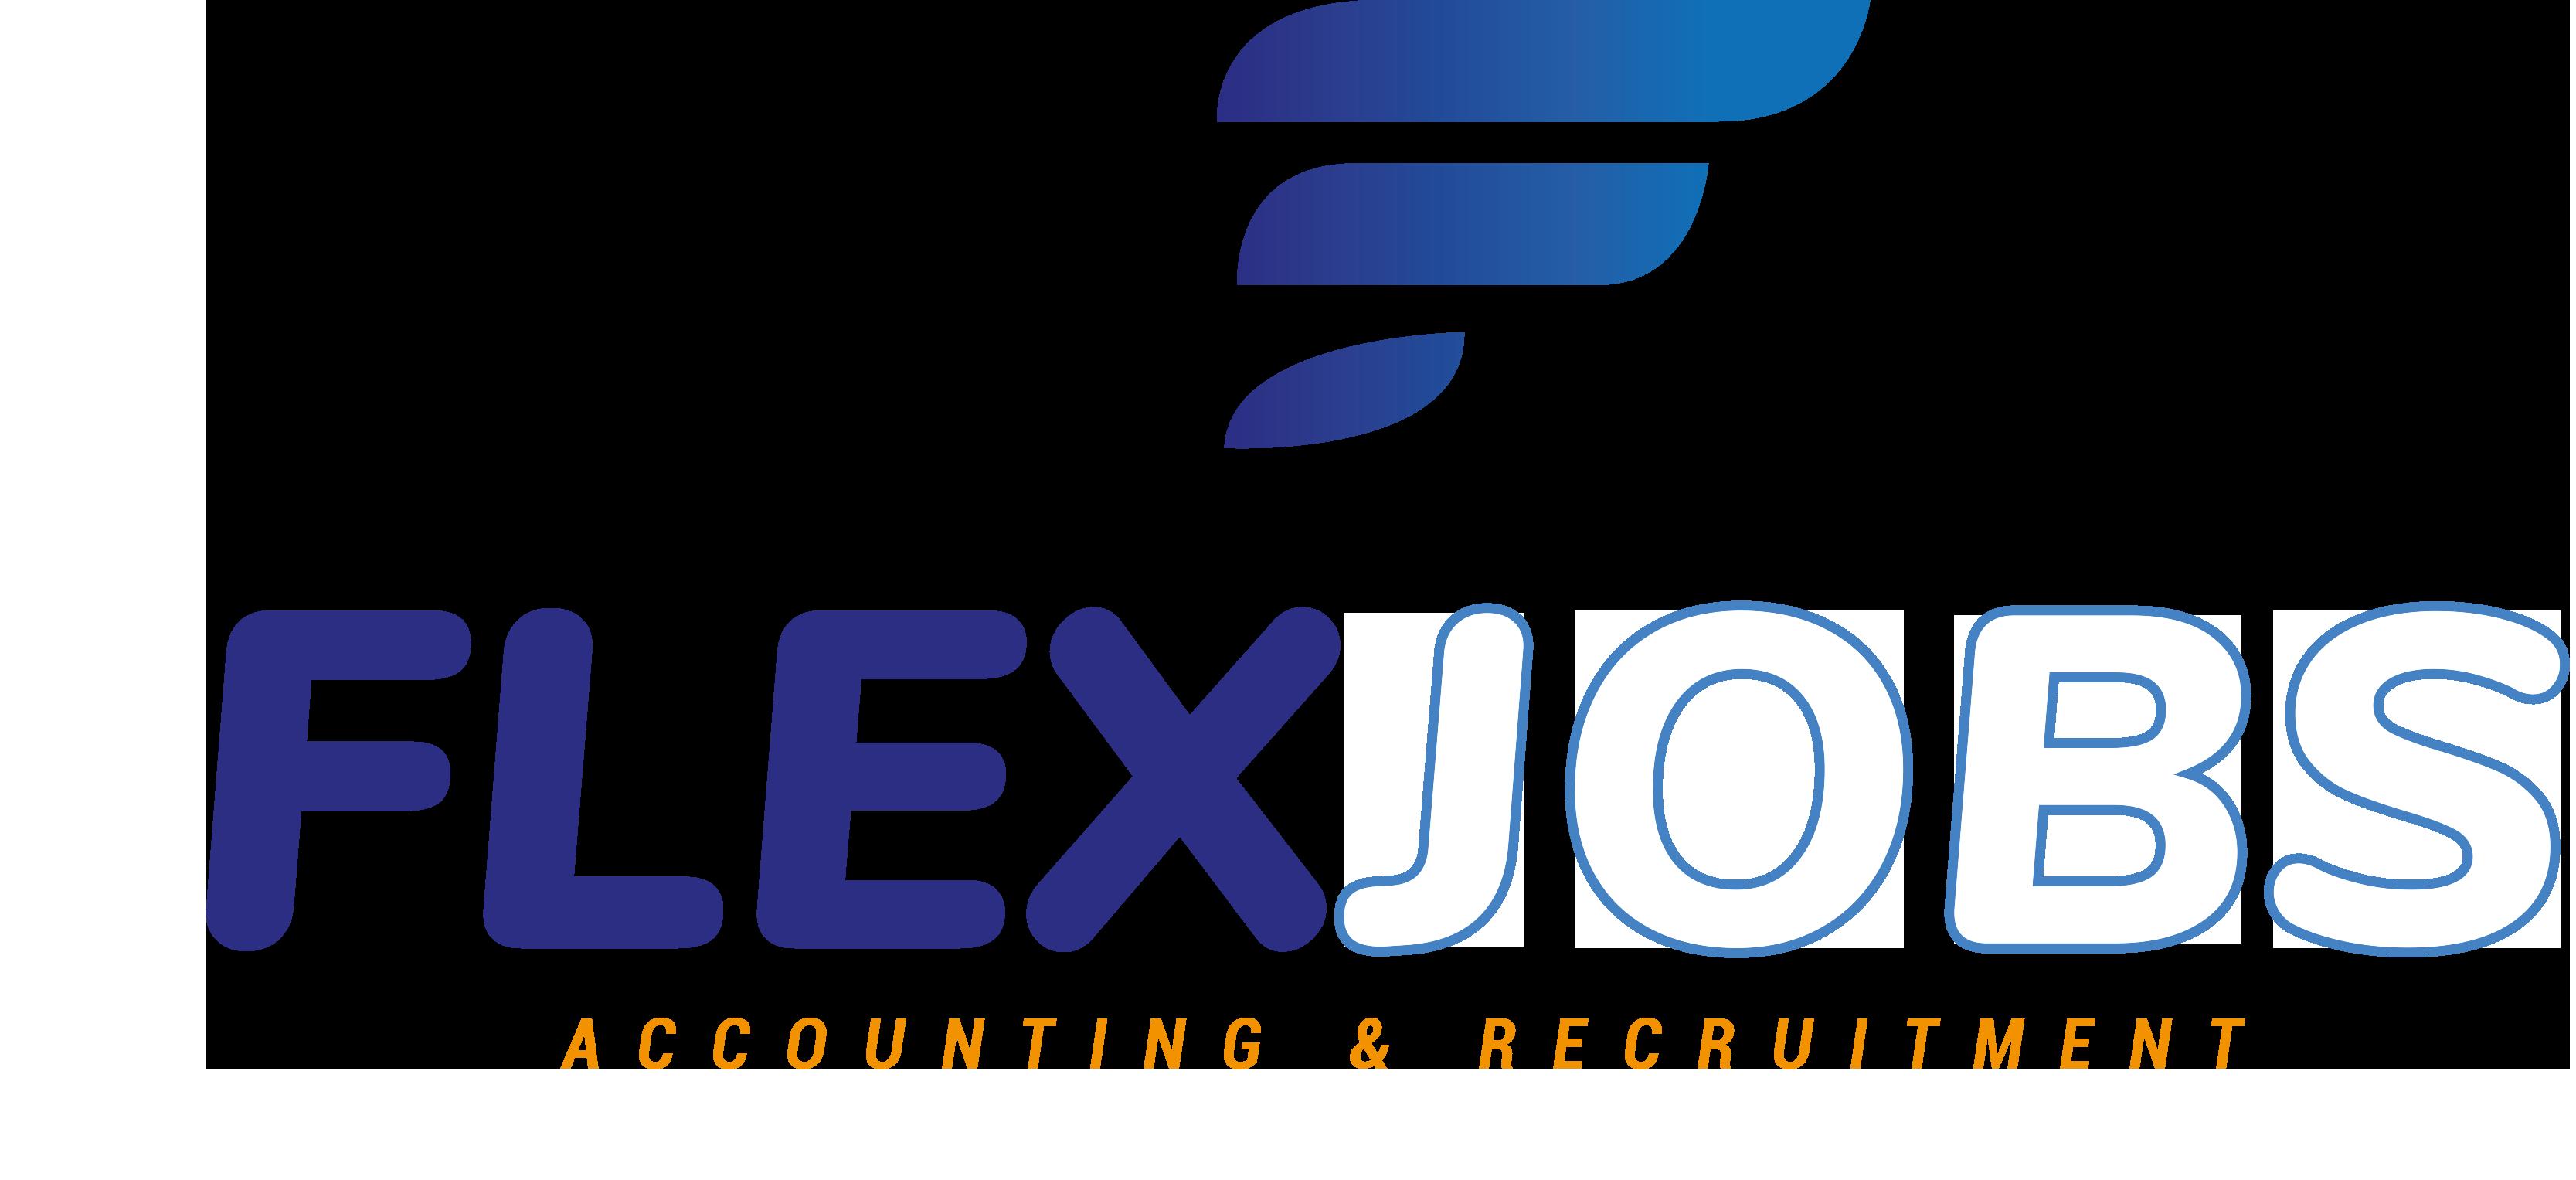 Flex-jobs